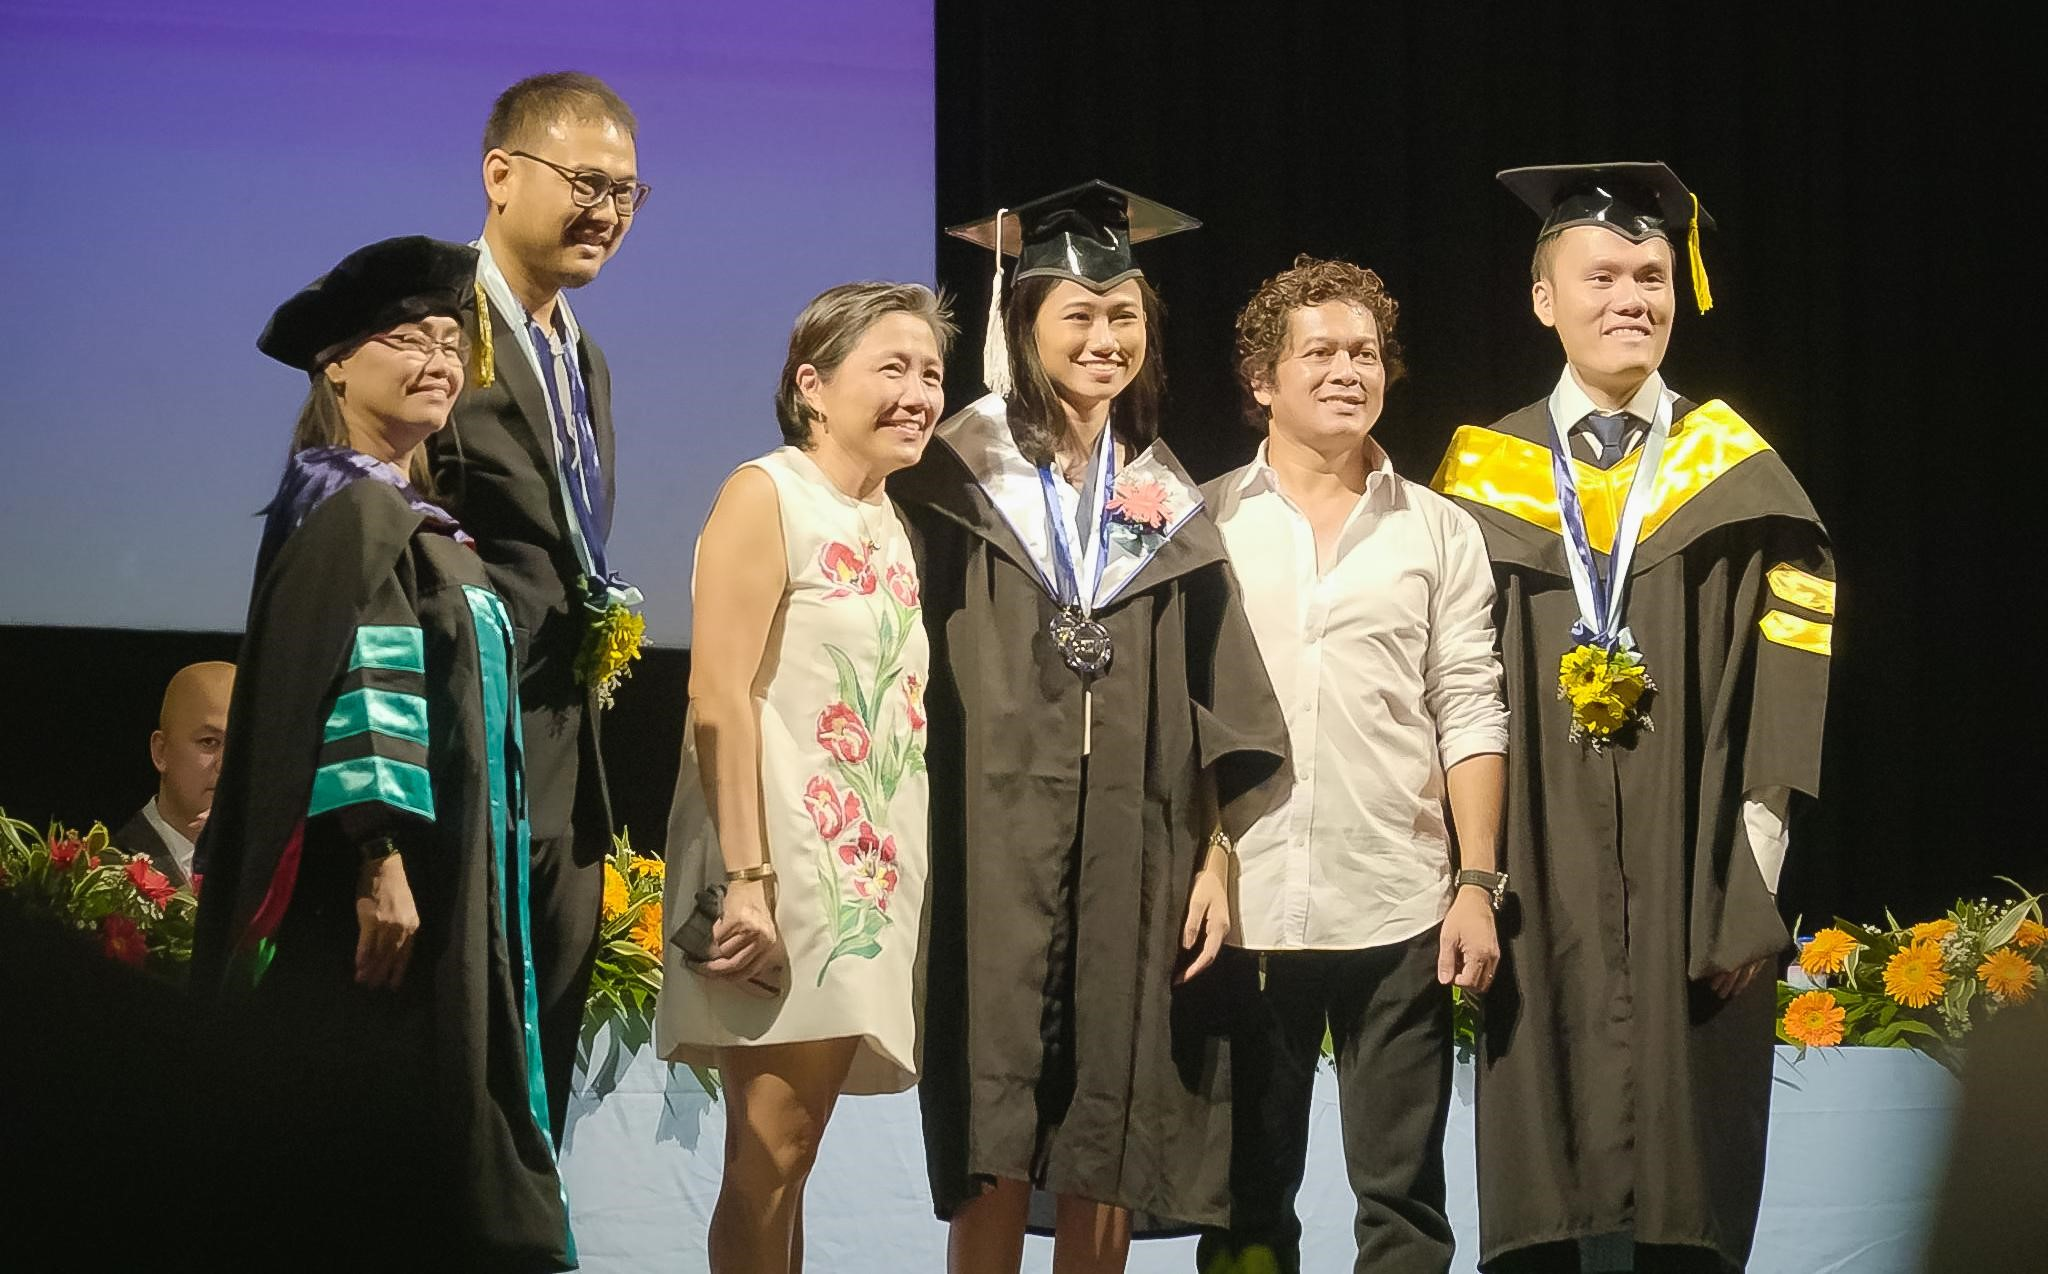 CIIT Commencement Ceremony – Audrelene Janelle Paez, Valedictorian